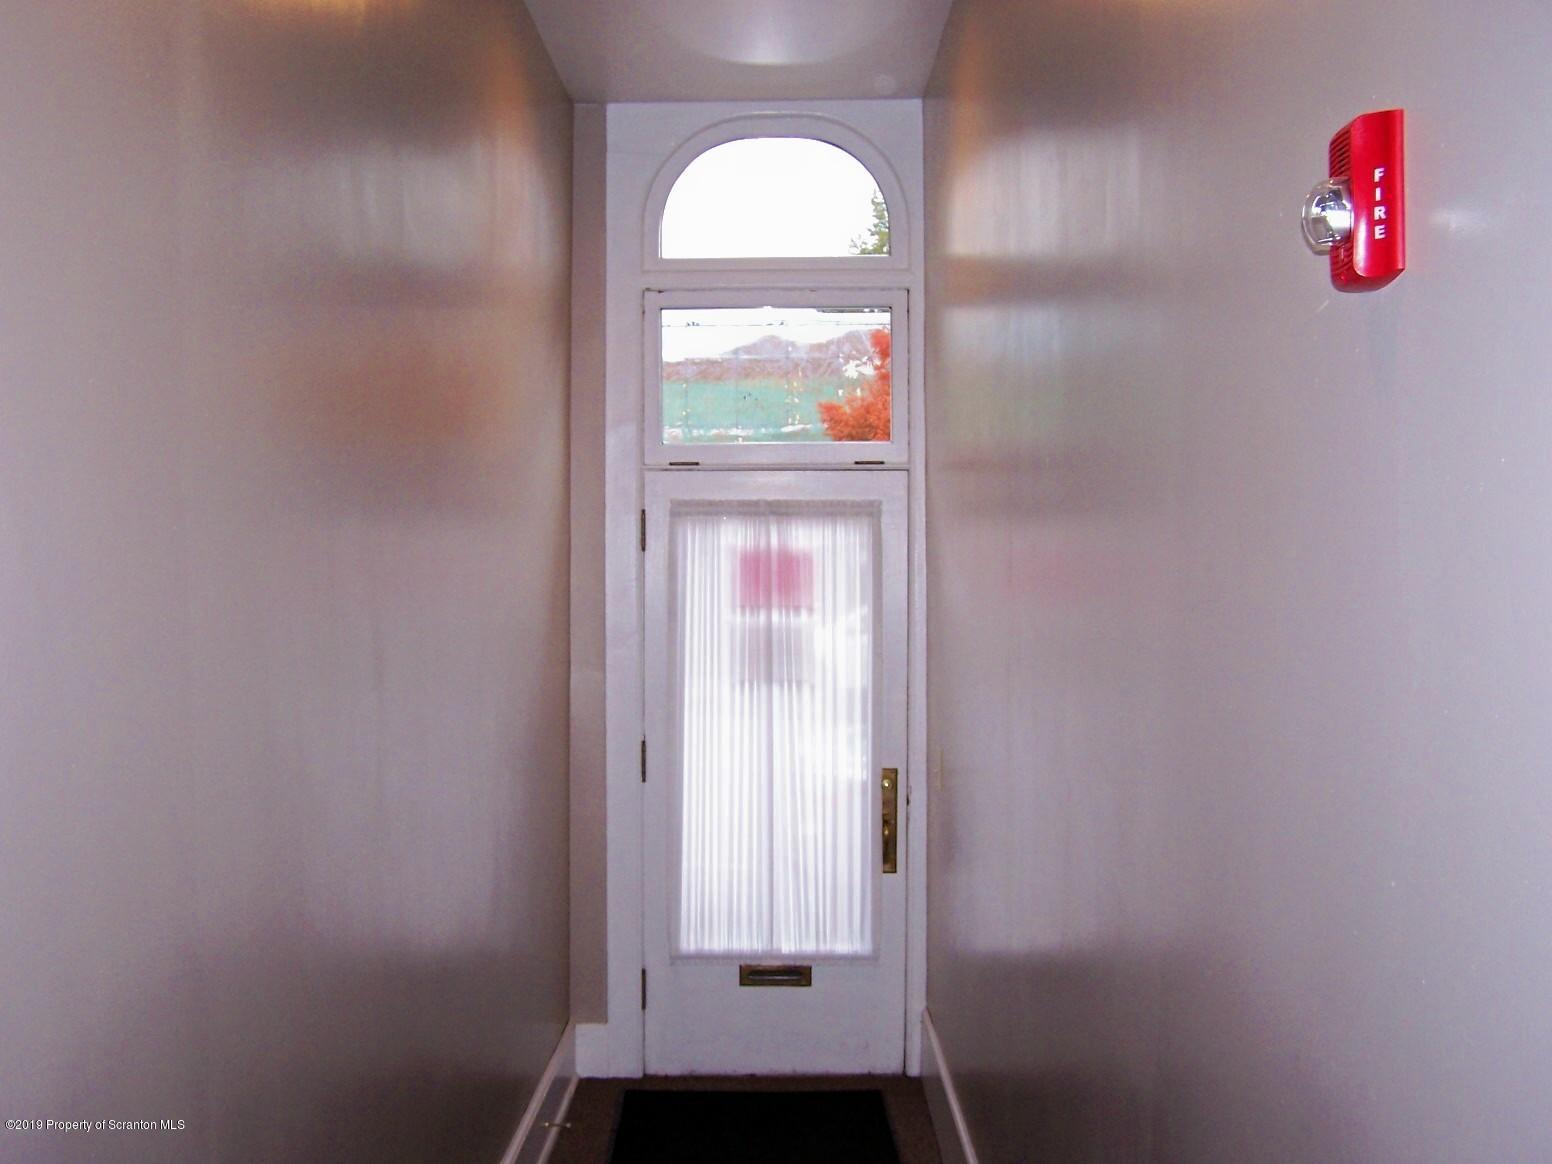 18 Tioga Apt. 2 St, Tunkhannock, Pennsylvania 18657, 1 Bedroom Bedrooms, 3 Rooms Rooms,1 BathroomBathrooms,Rental,For Lease,Tioga,20-3818